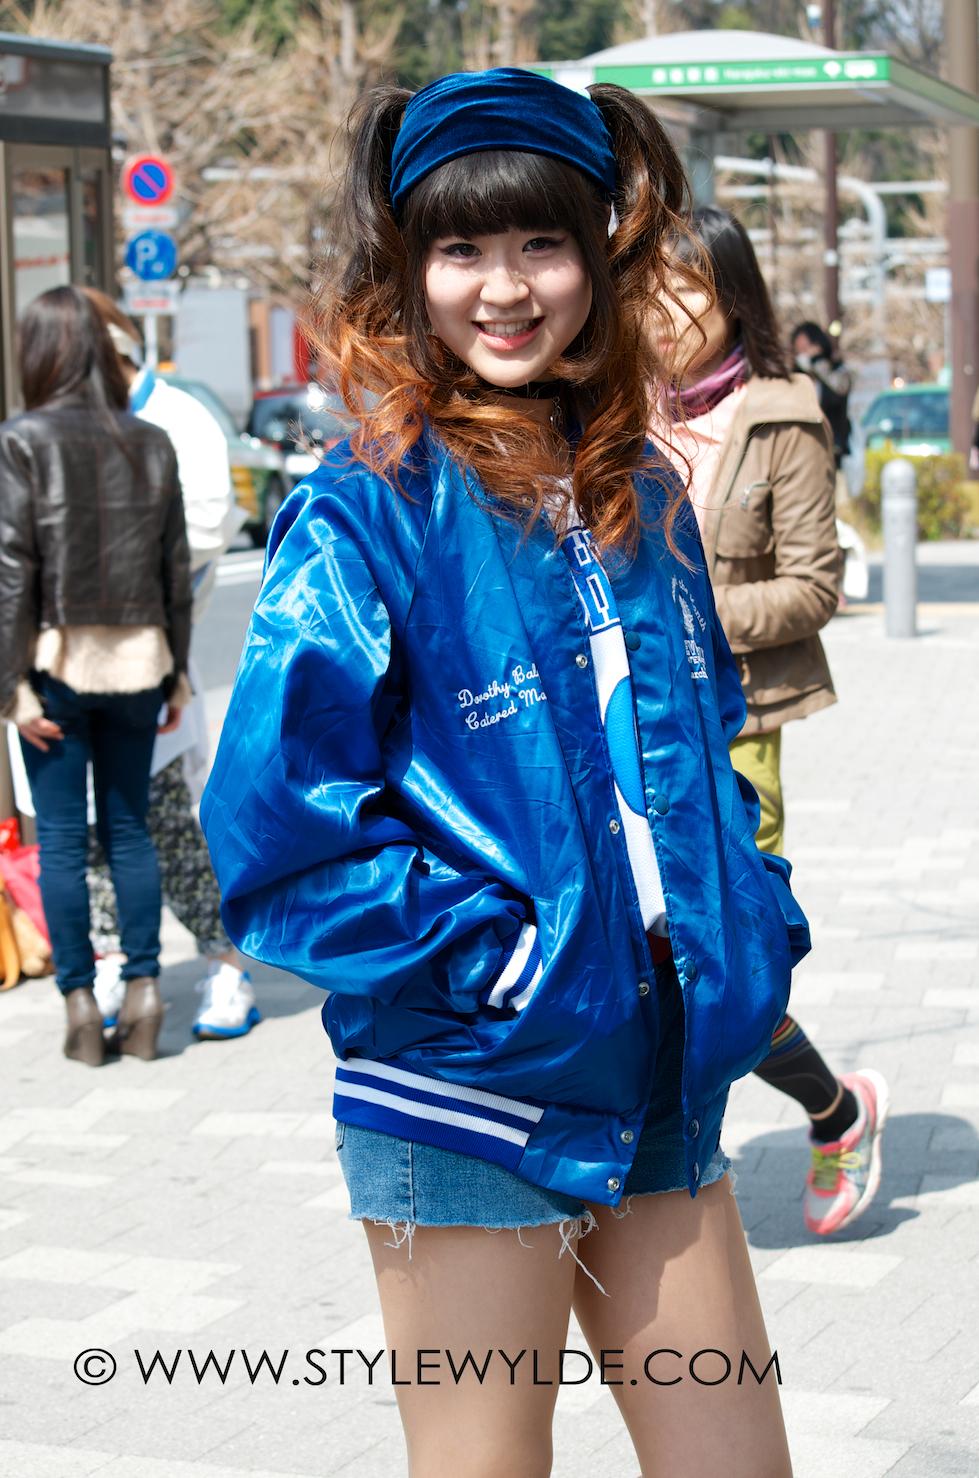 sstylewylde_Harujuku3_17_streetstyle3.jpg